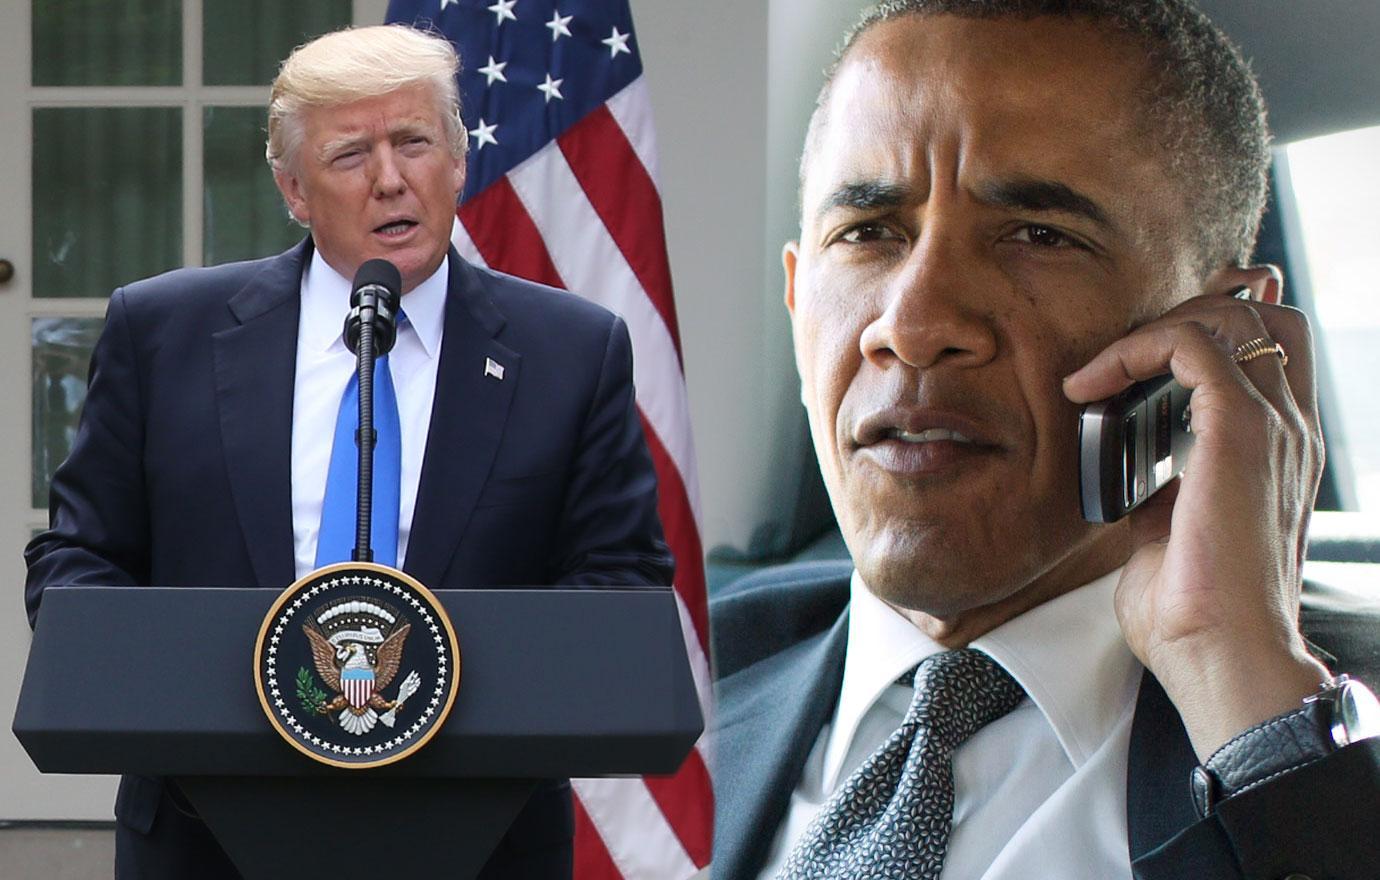 Barack Obama Operates Secret War Room To Oppose Donald Trump